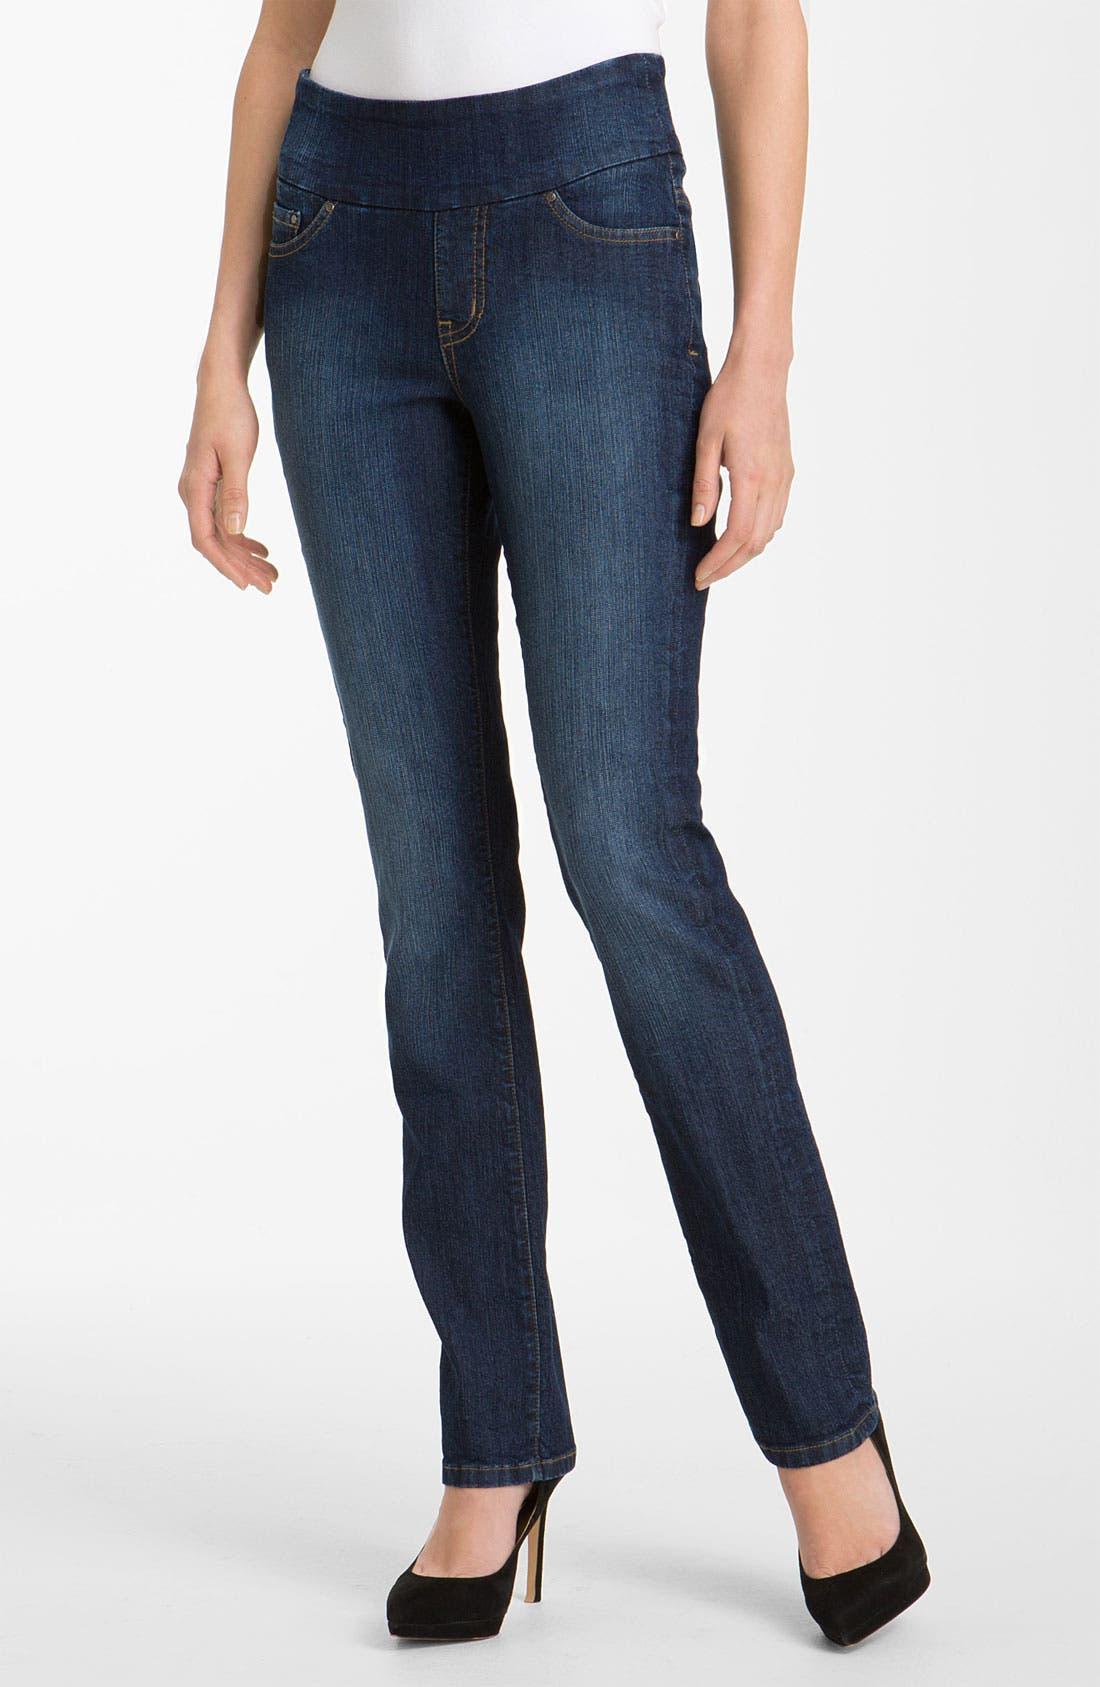 Alternate Image 1 Selected - Jag Jeans 'Peri' Pull-On Jeans (Petite)